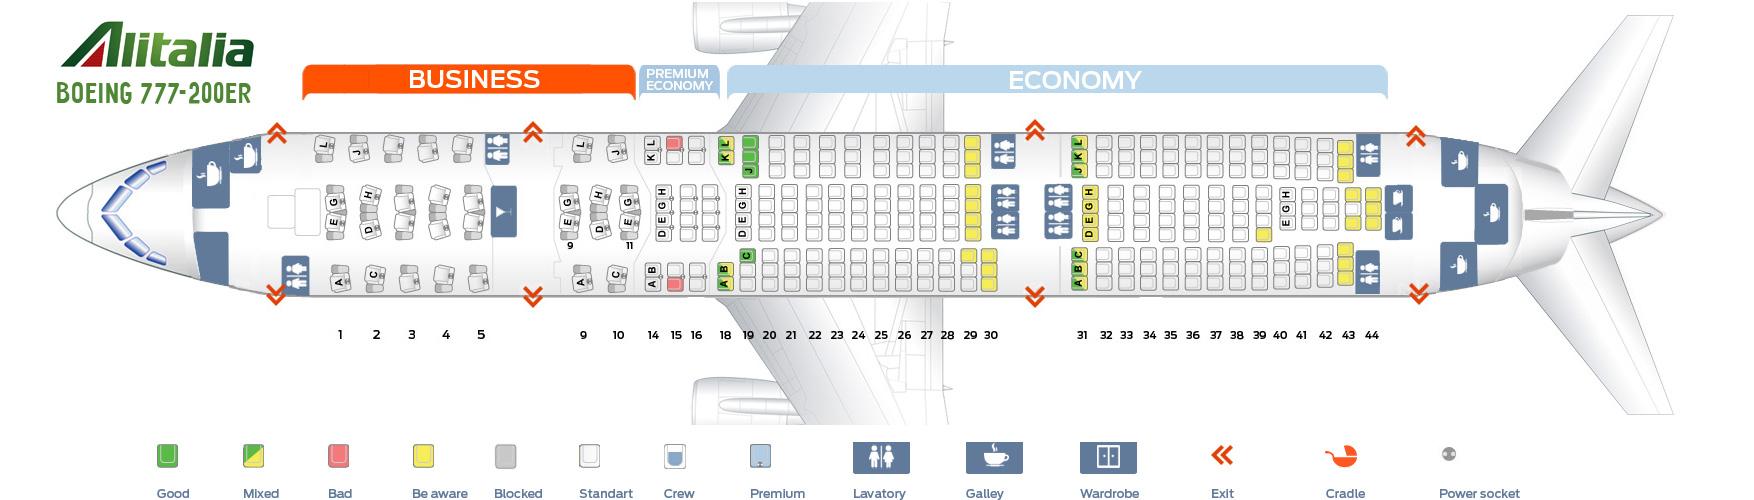 Seat Map Boeing 777 200er Alitalia Airlines